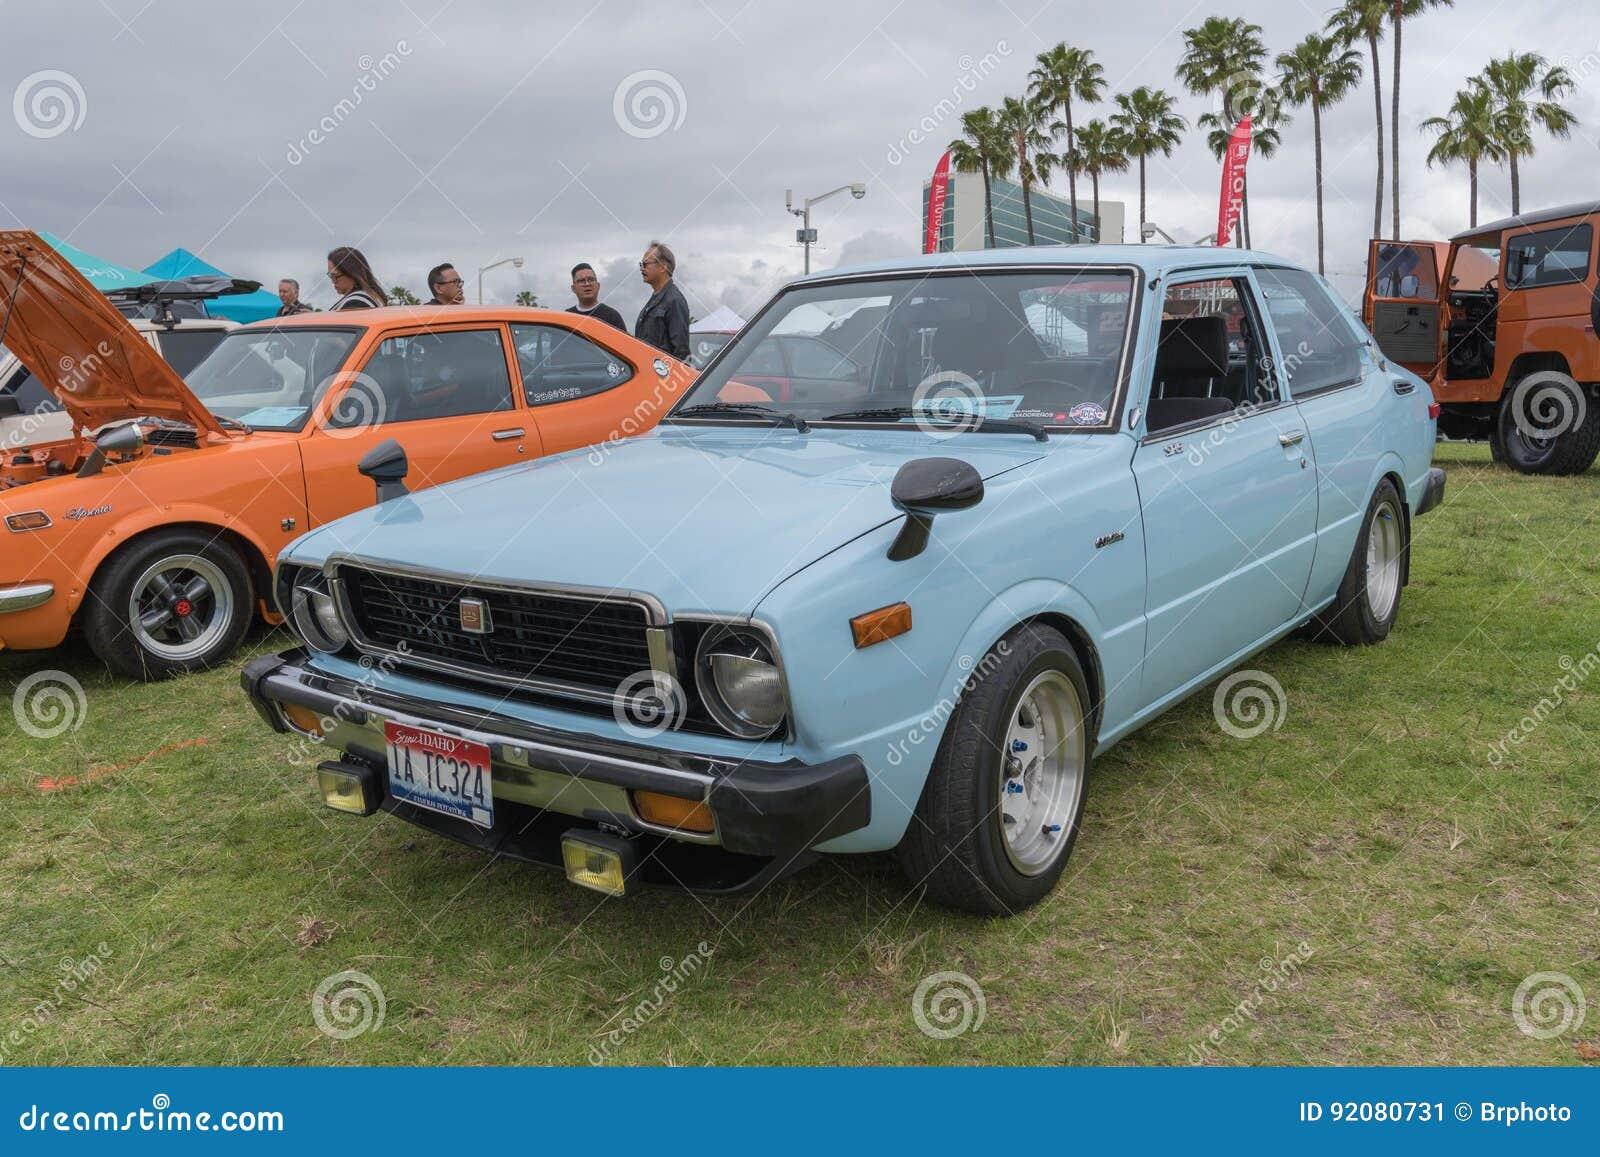 Kelebihan Toyota Corolla 1978 Tangguh